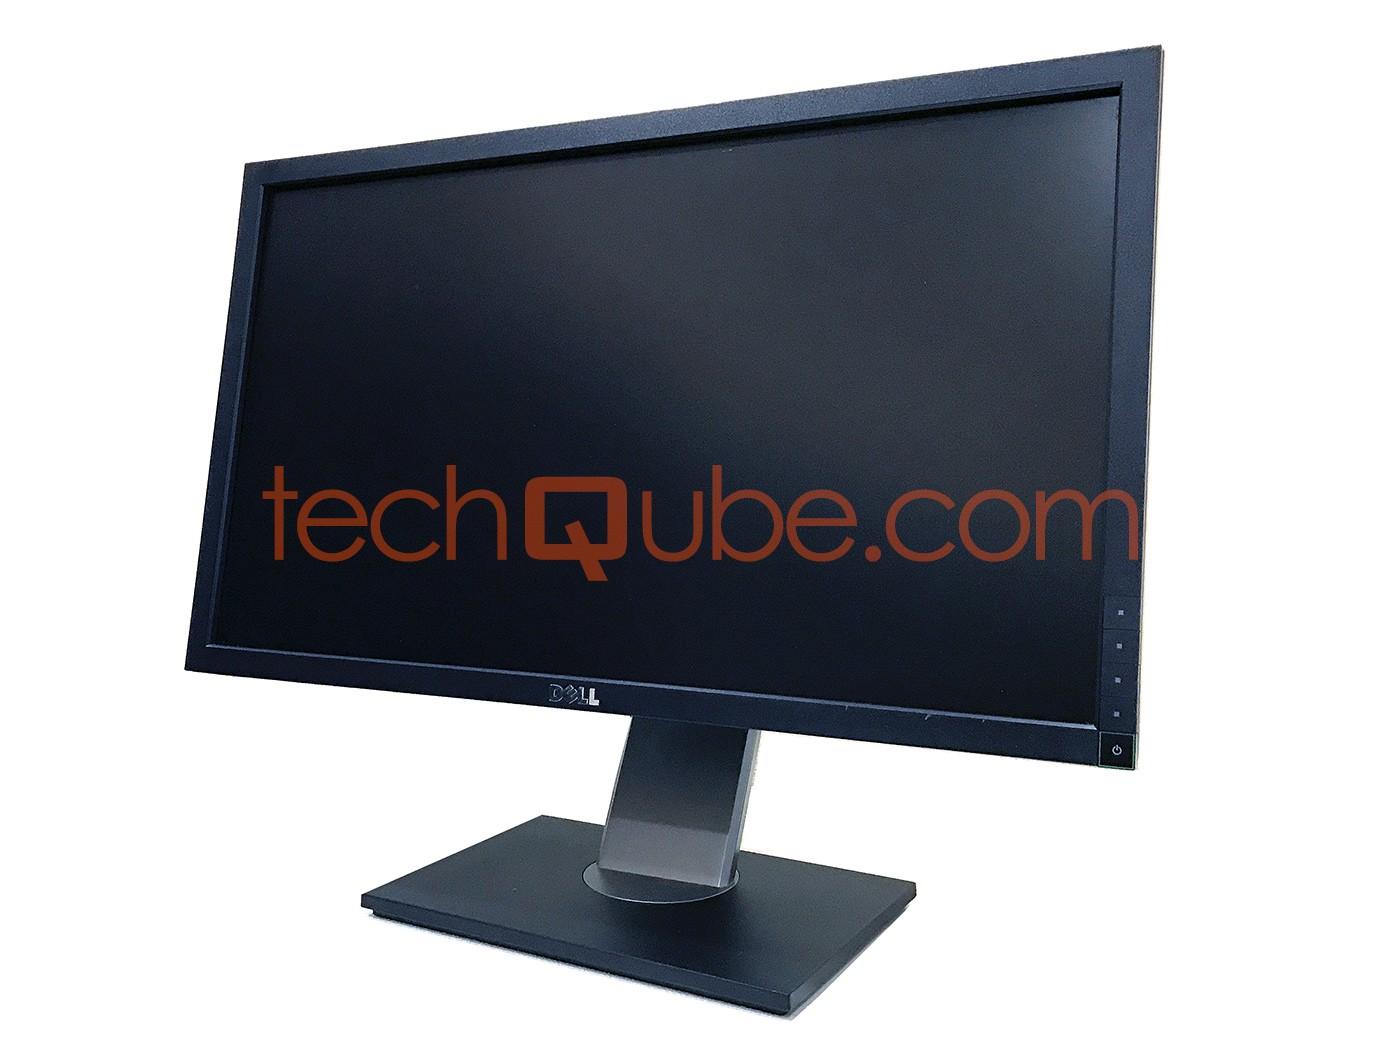 E1910 48cm (19 ) Widescreen Flat Panel Monitor